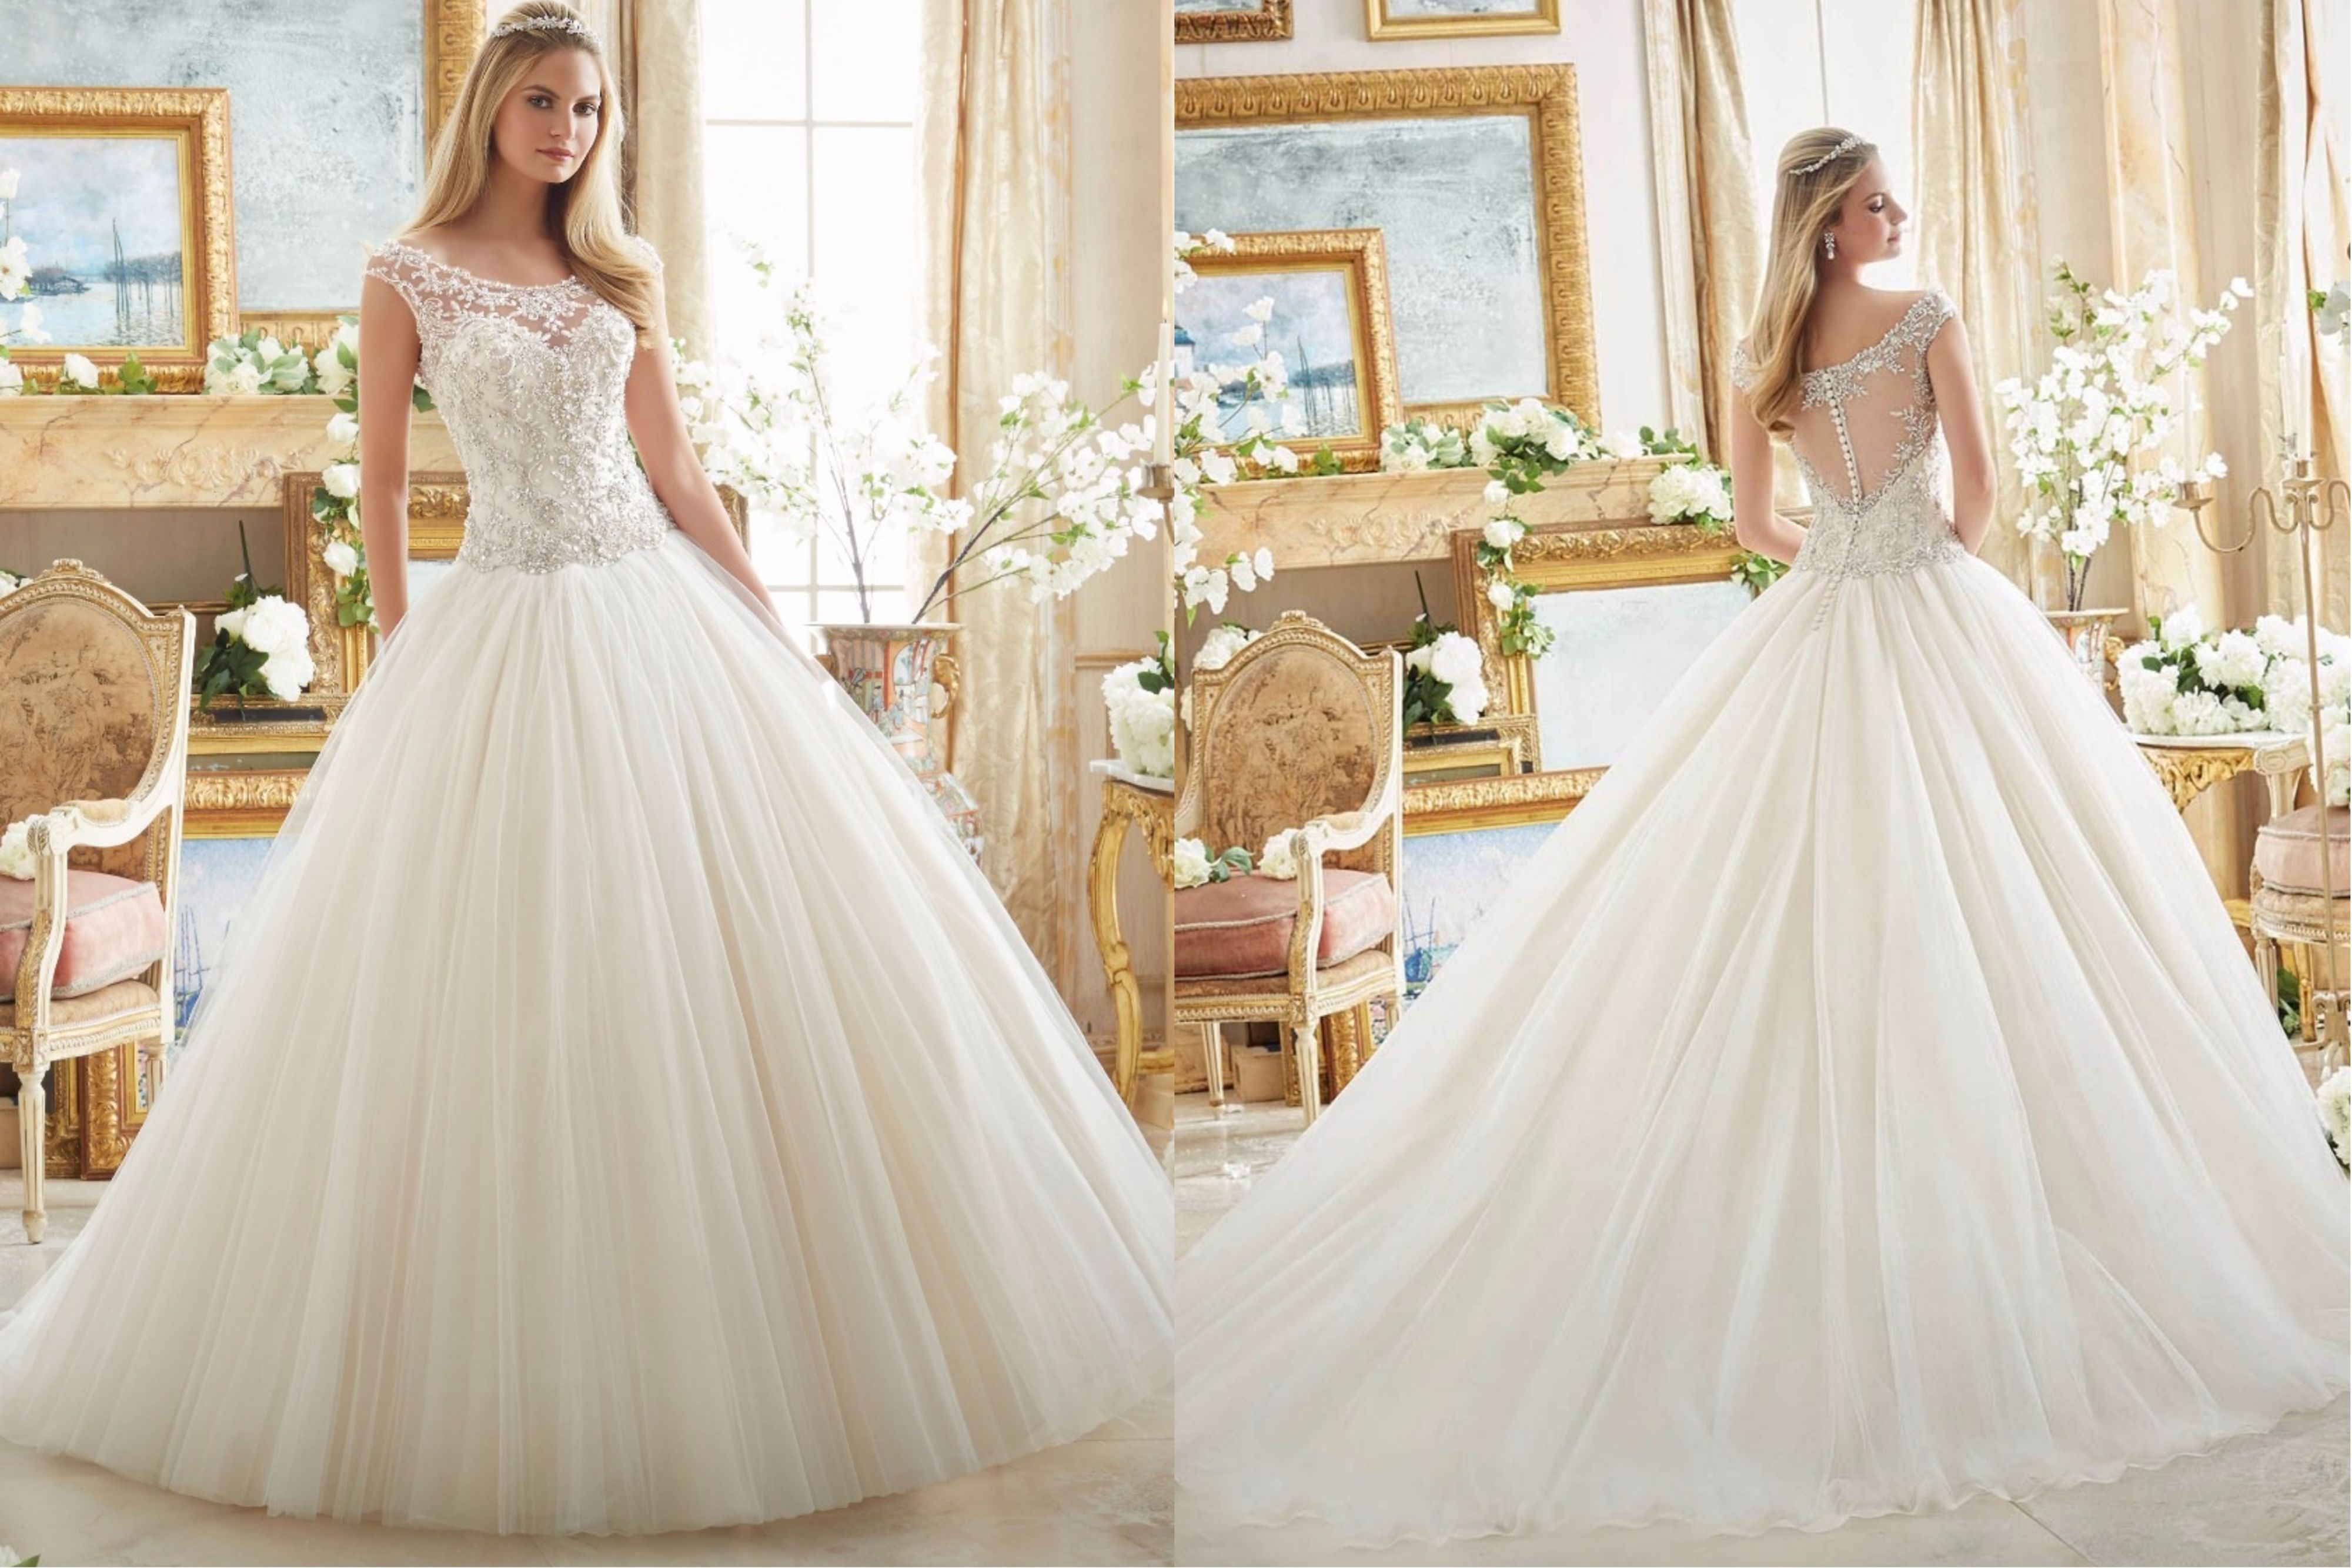 Stephanies Bruidsboutique trouwjurk